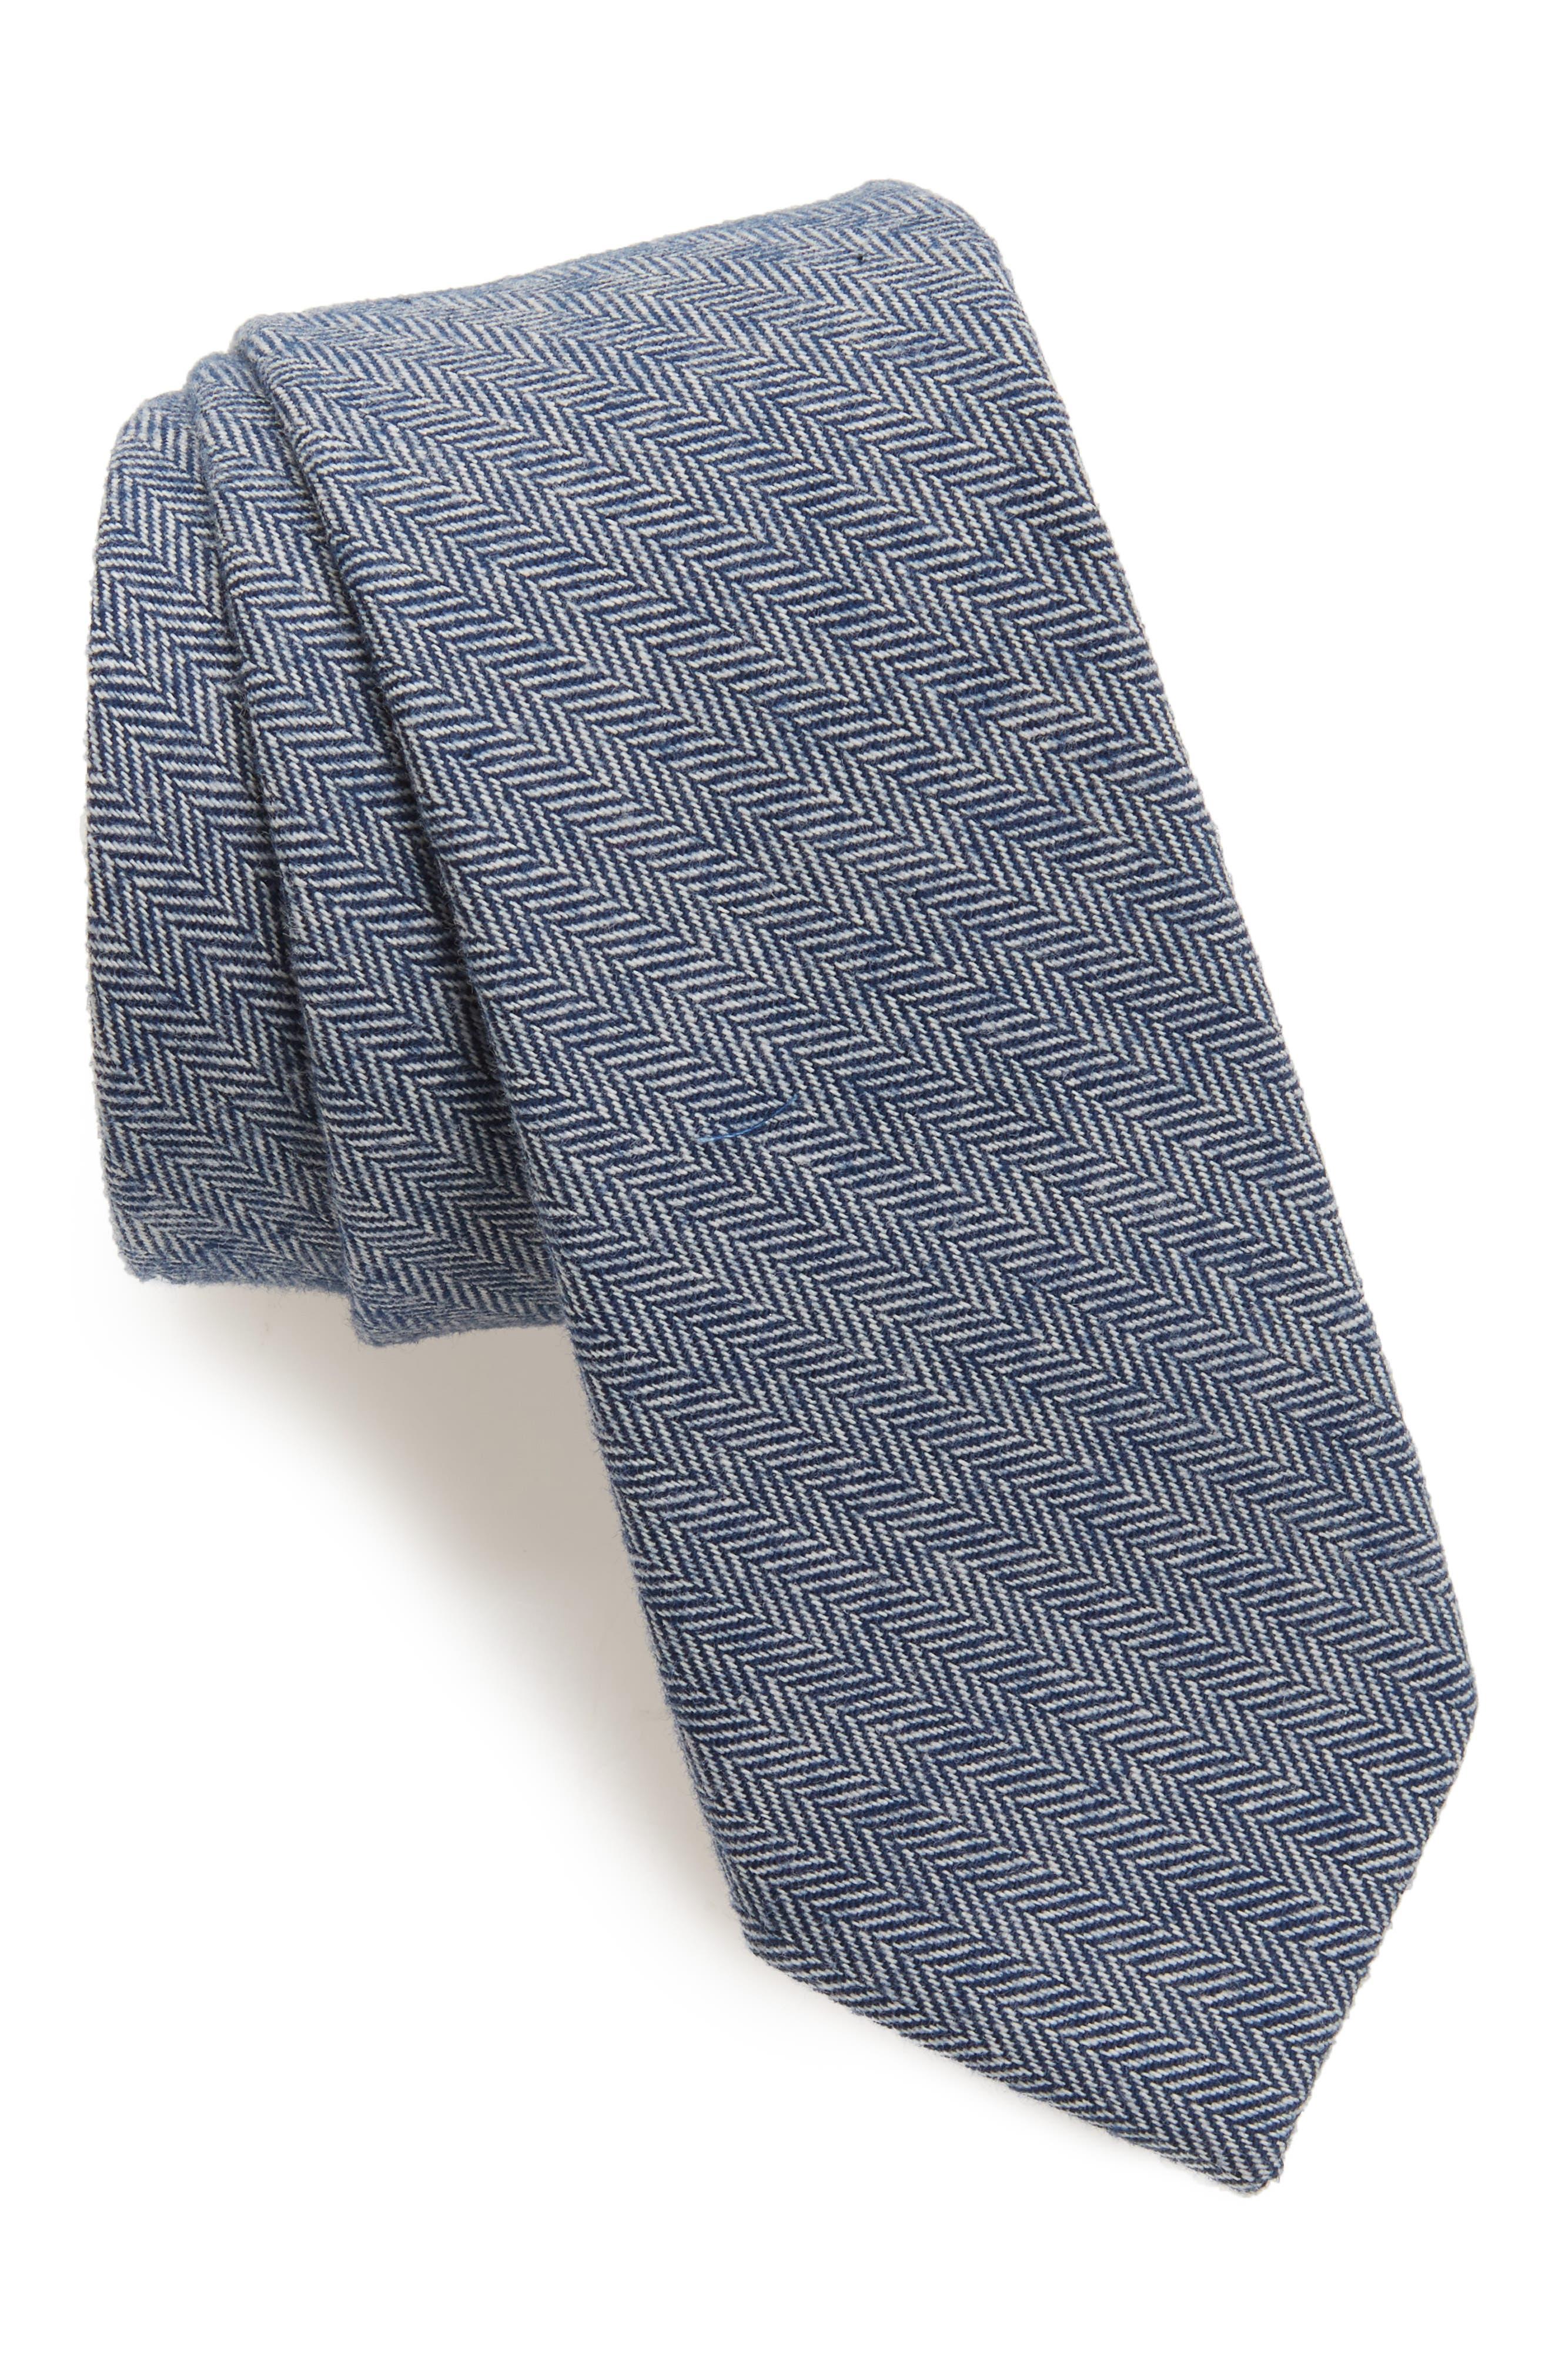 Herringbone Stretch Cotton Tie,                             Main thumbnail 1, color,                             410